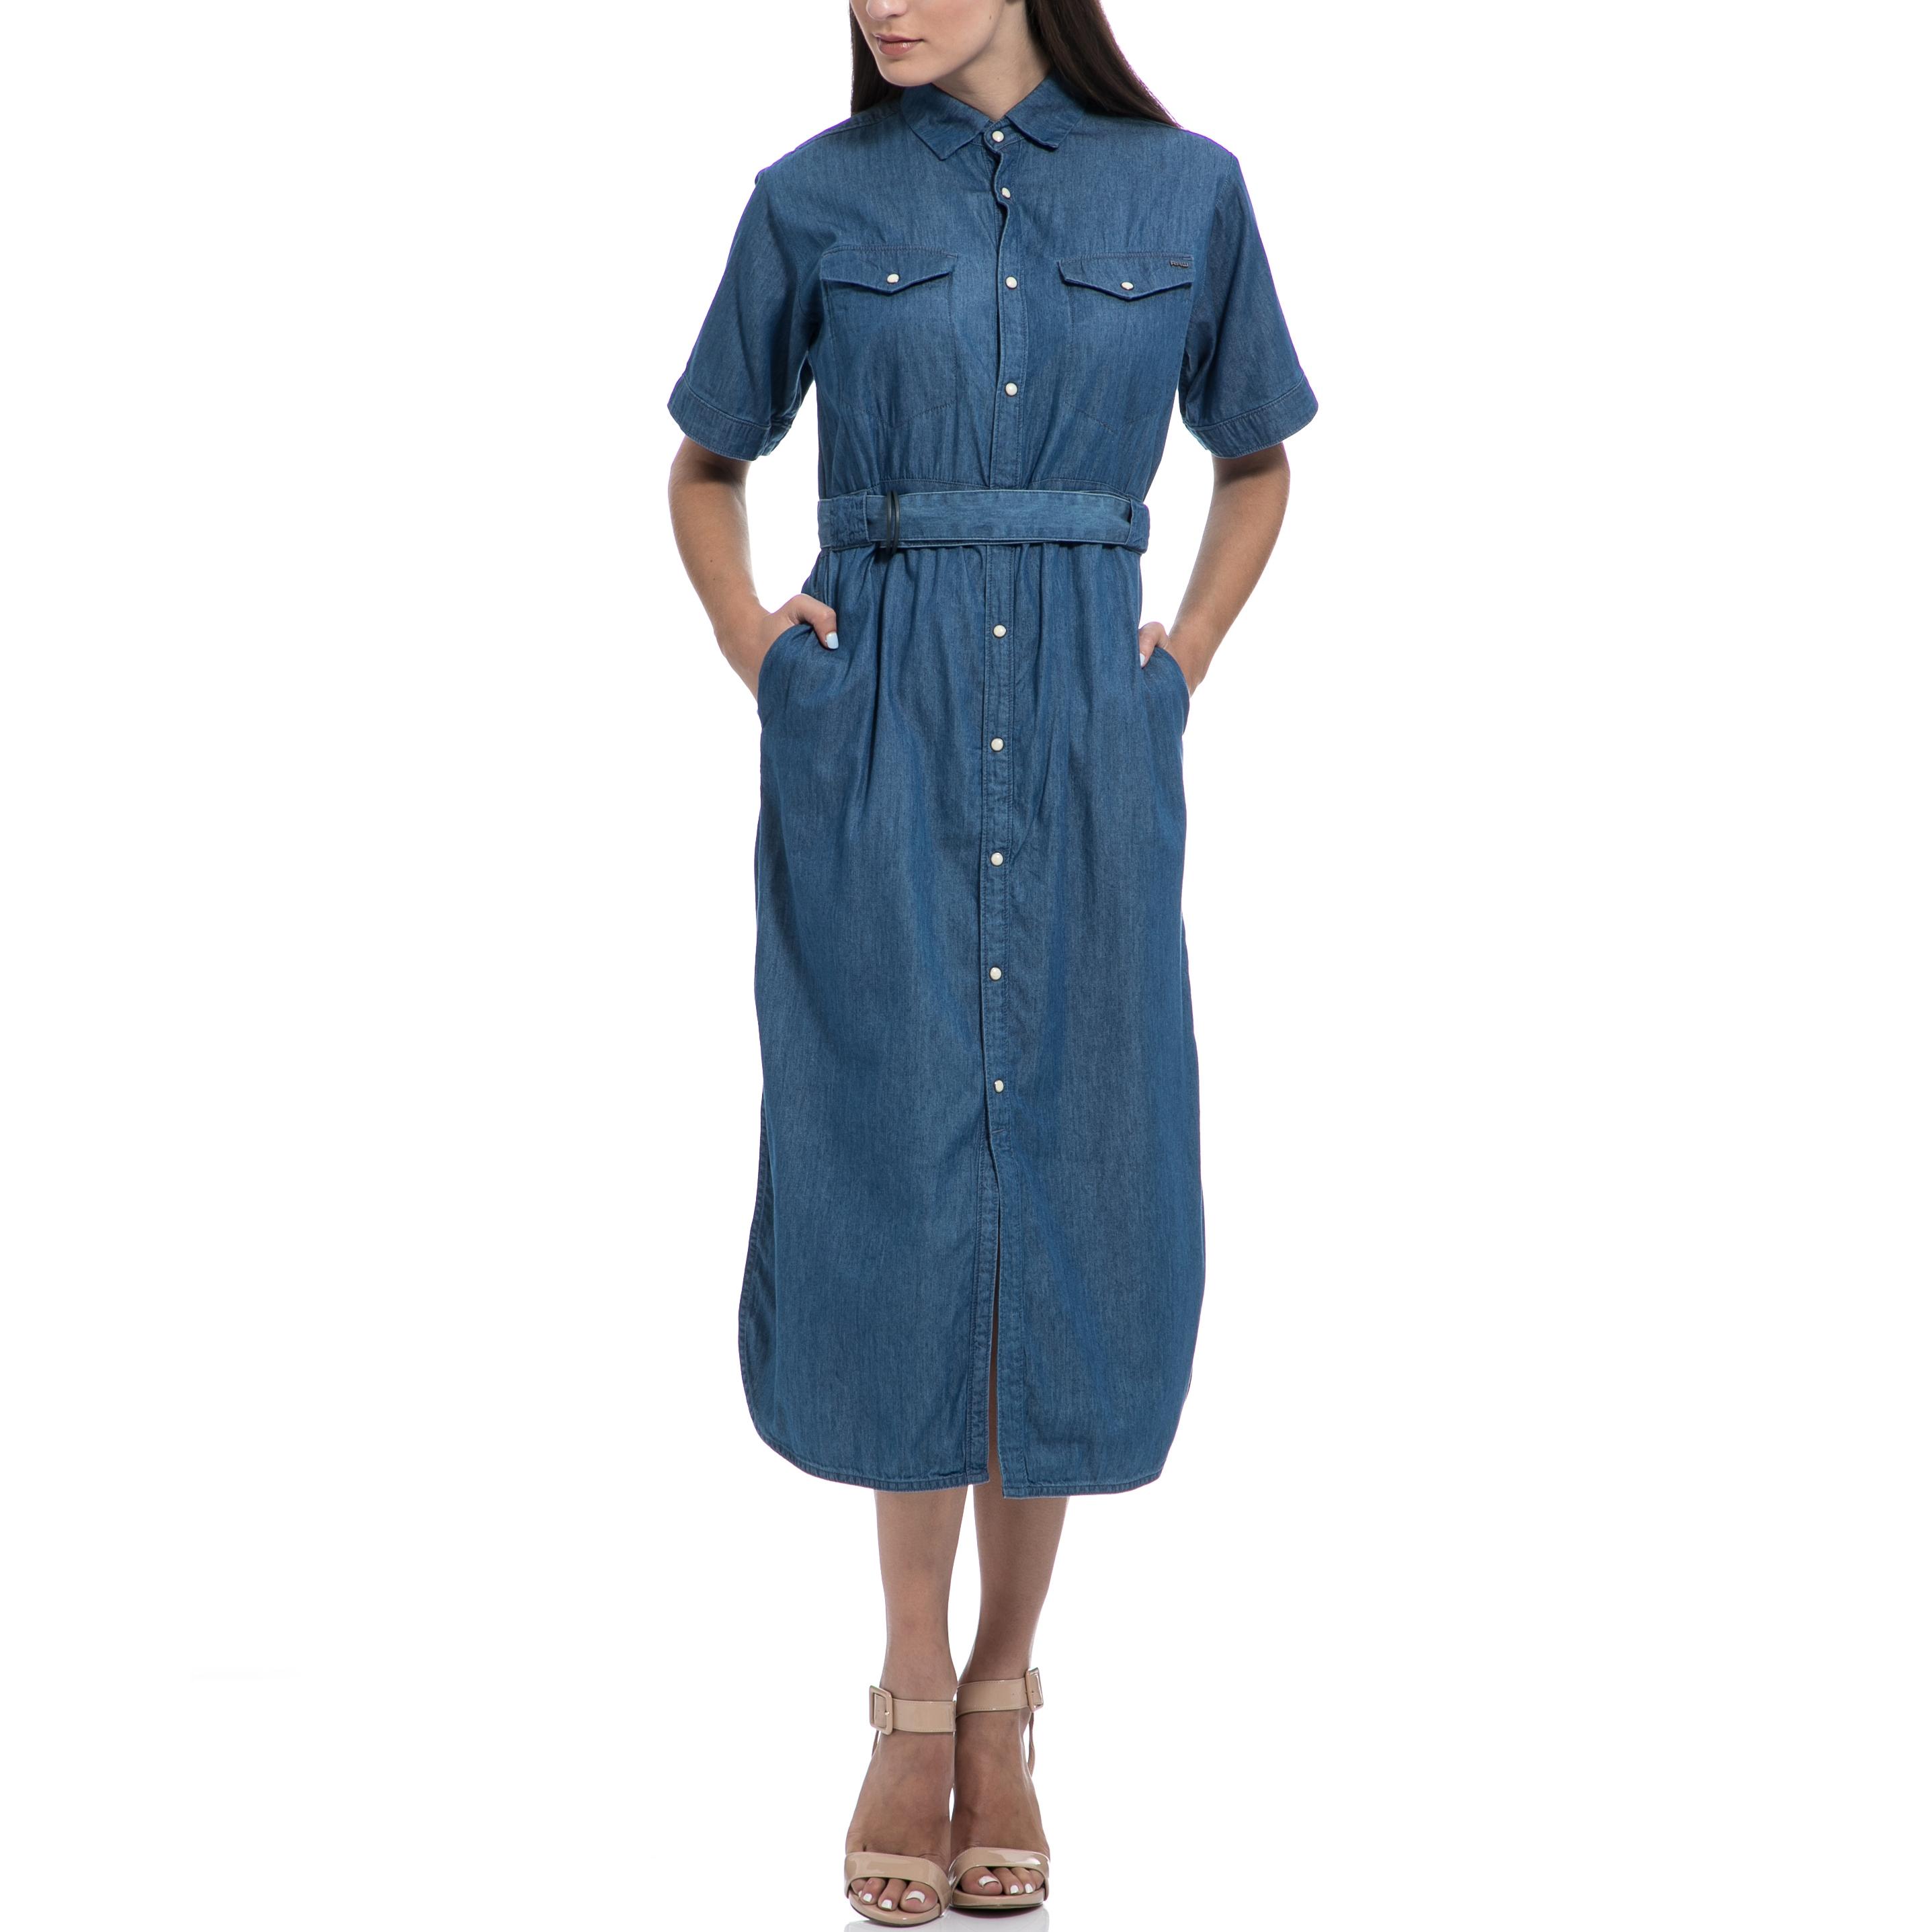 G-STAR RAW - Γυναικείο φόρεμα G-STAR RAW μπλε γυναικεία ρούχα φορέματα μάξι